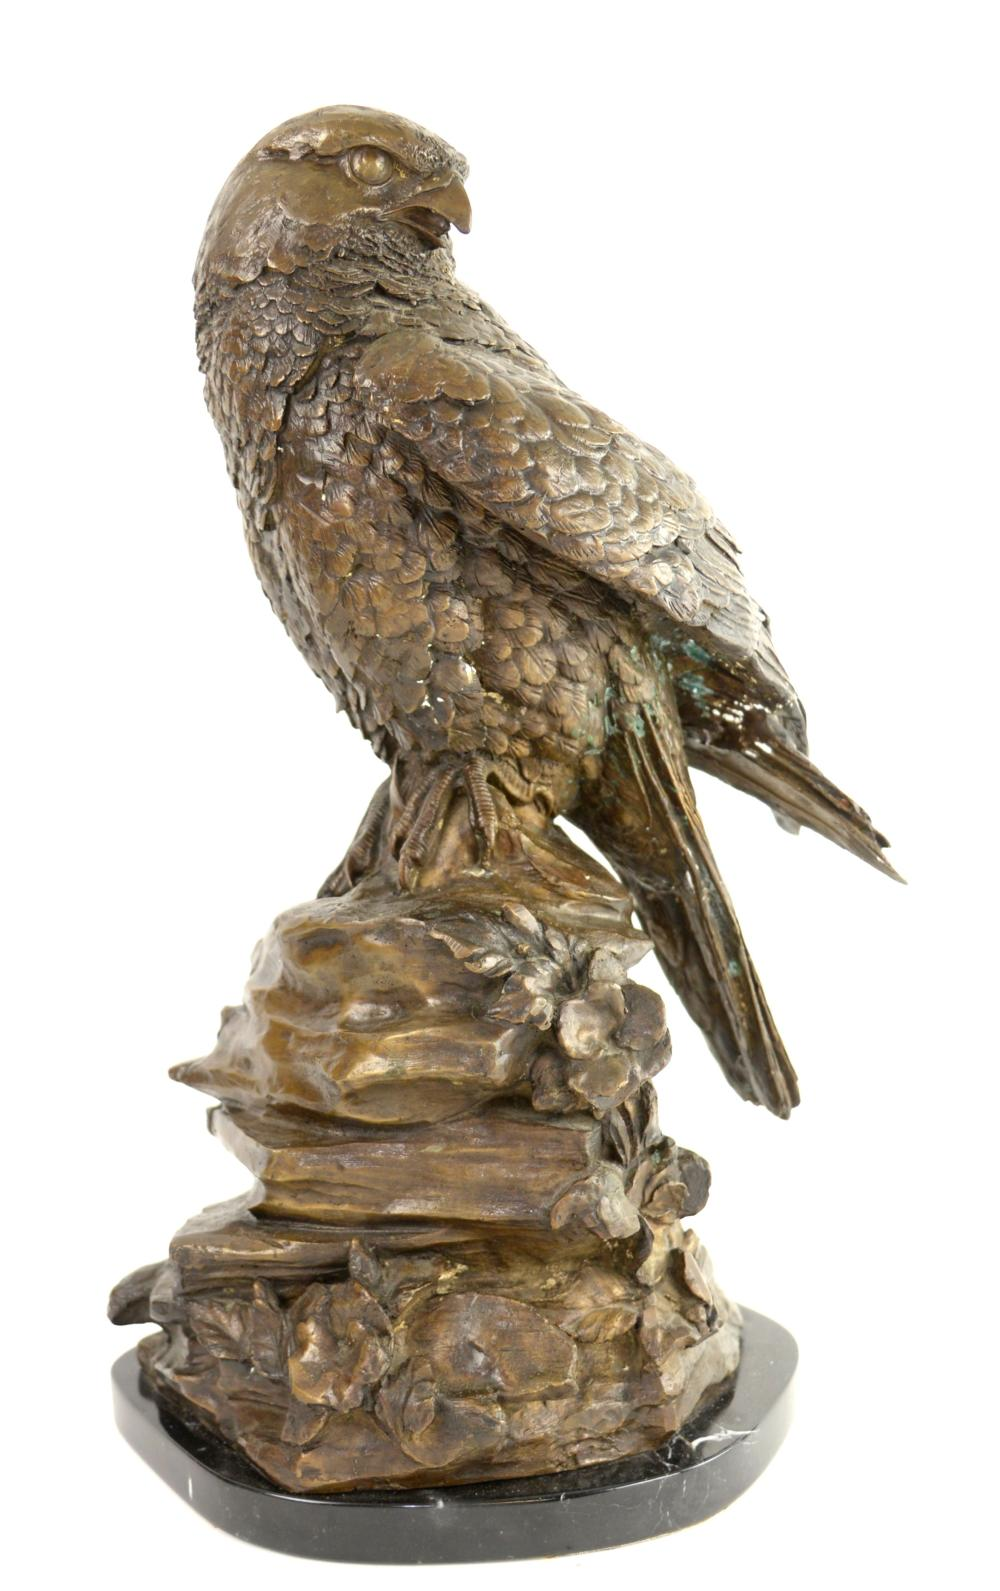 Bronze sculpture of an eagle on a rocky outcrop, i